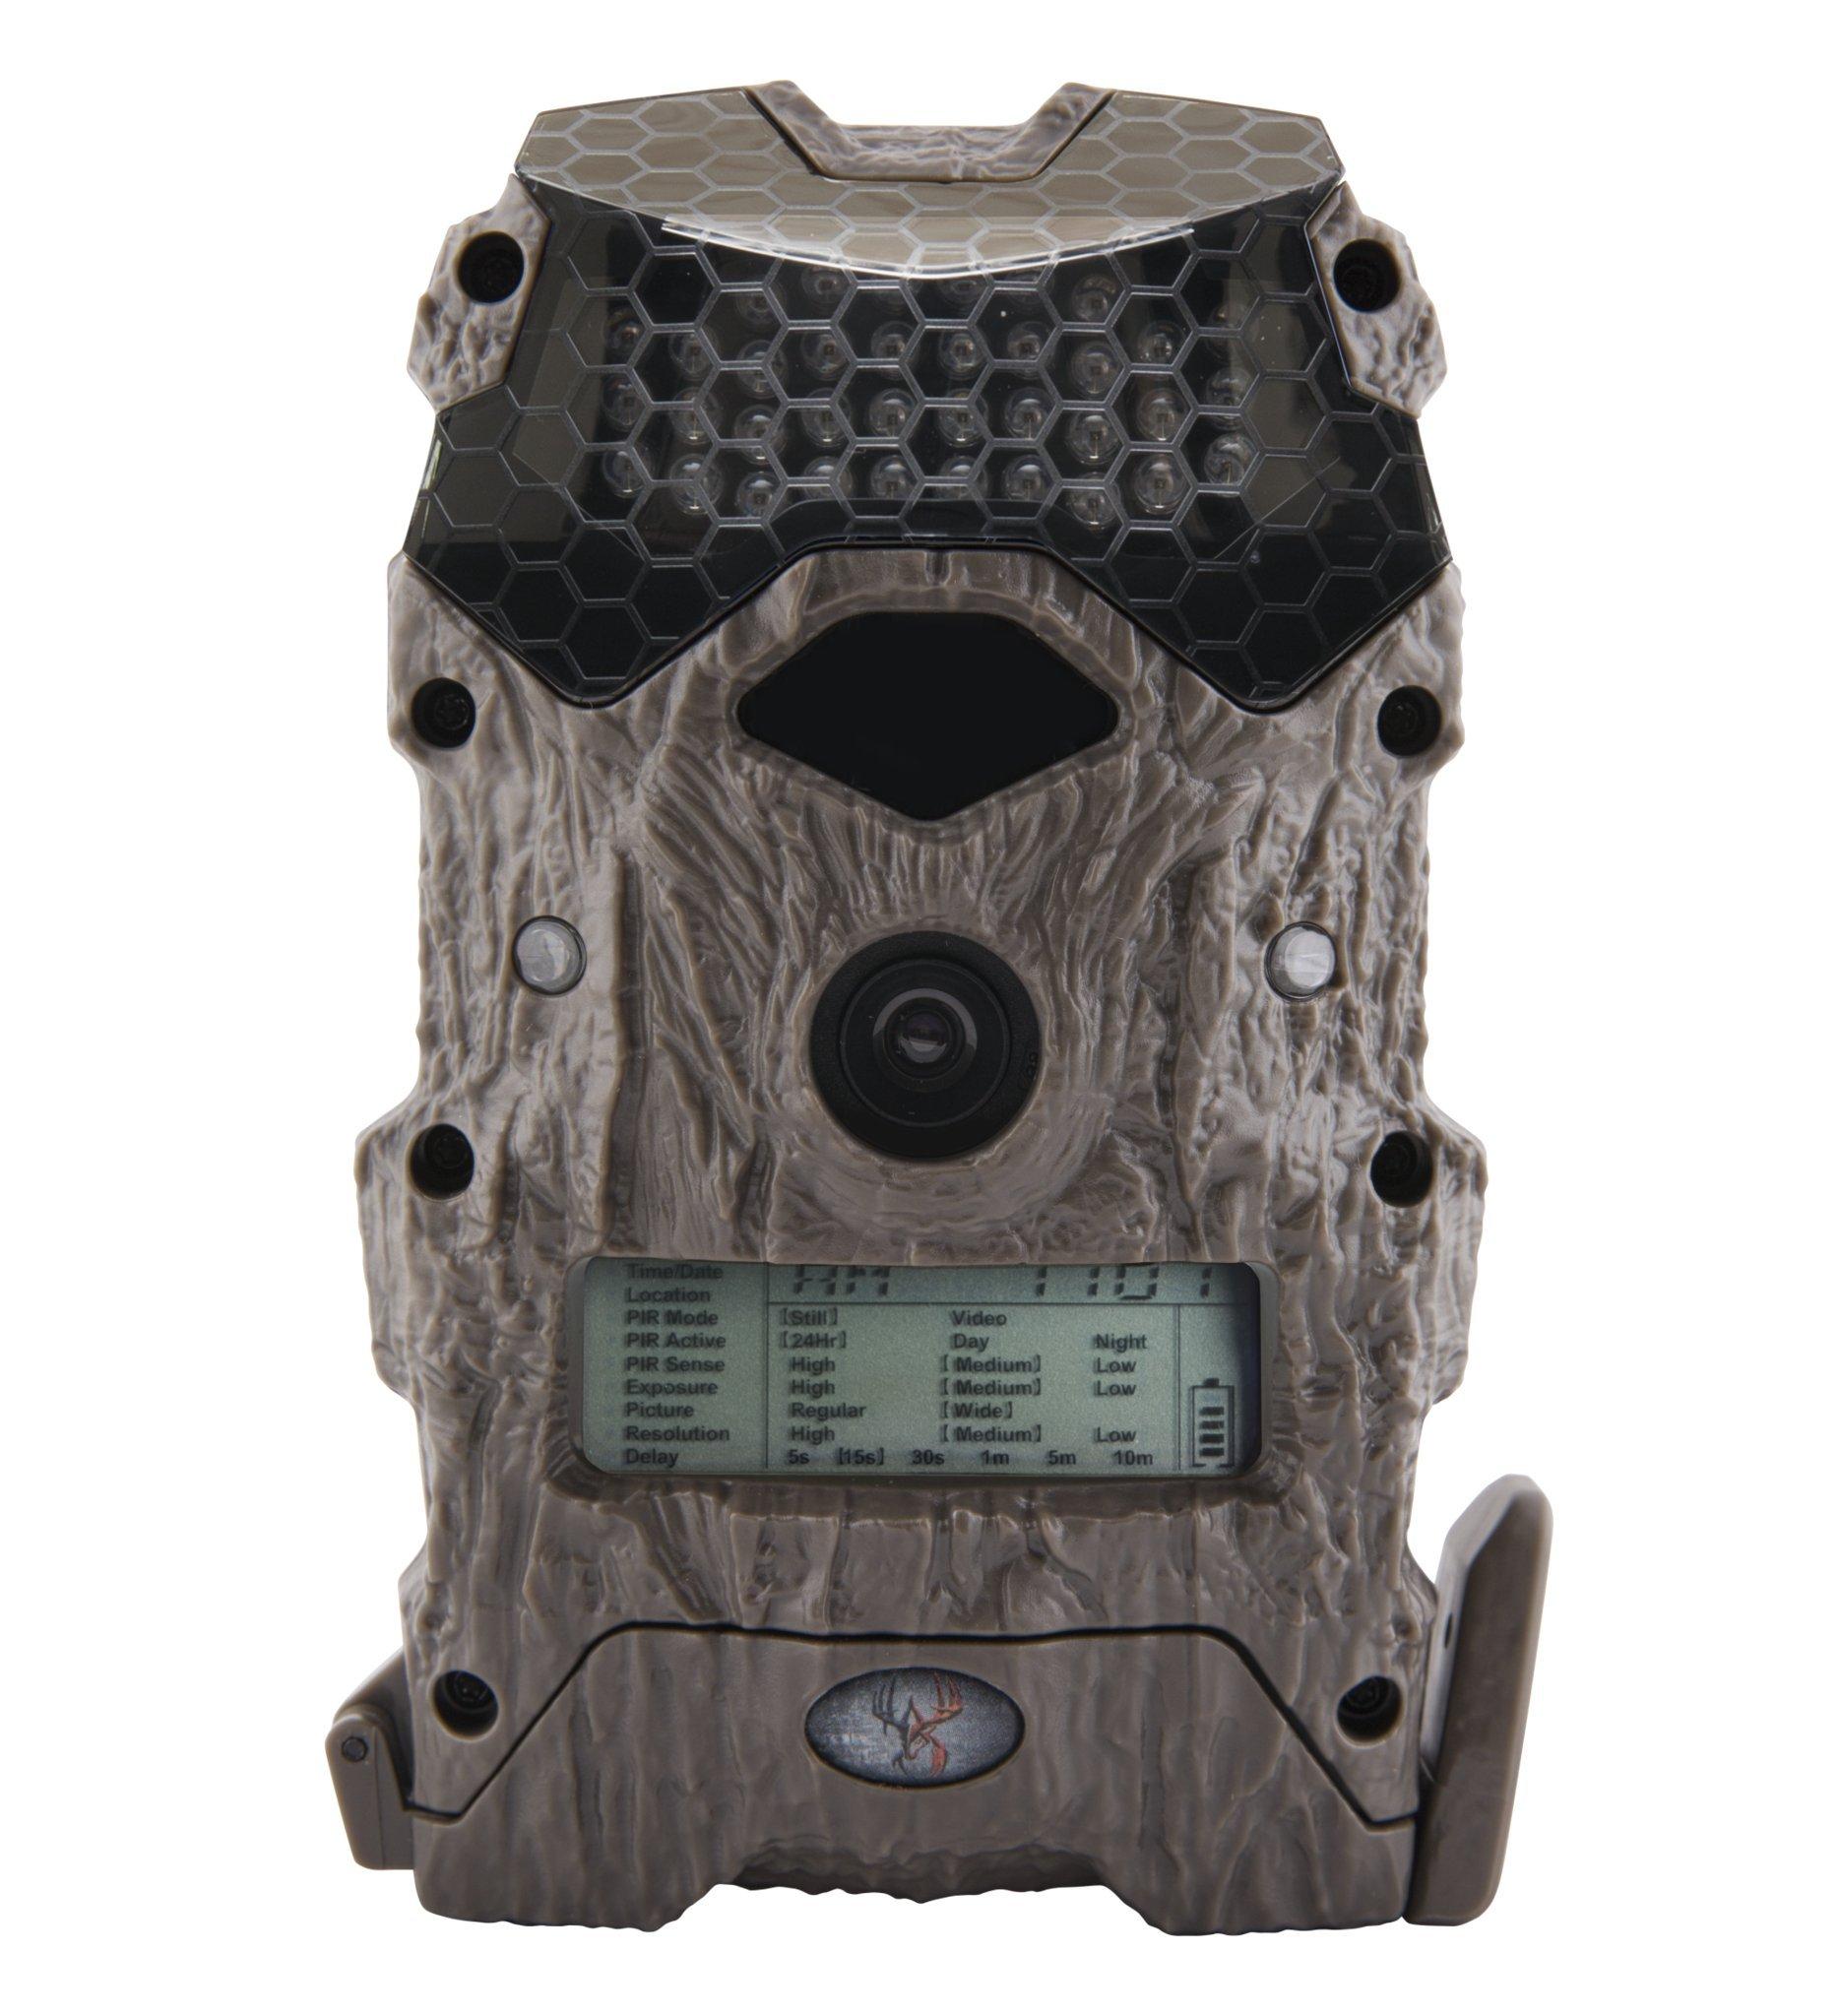 Wildgame Innovations M16i8-8 Mirage Series Cam, 16 MP, IR, Tru Bark